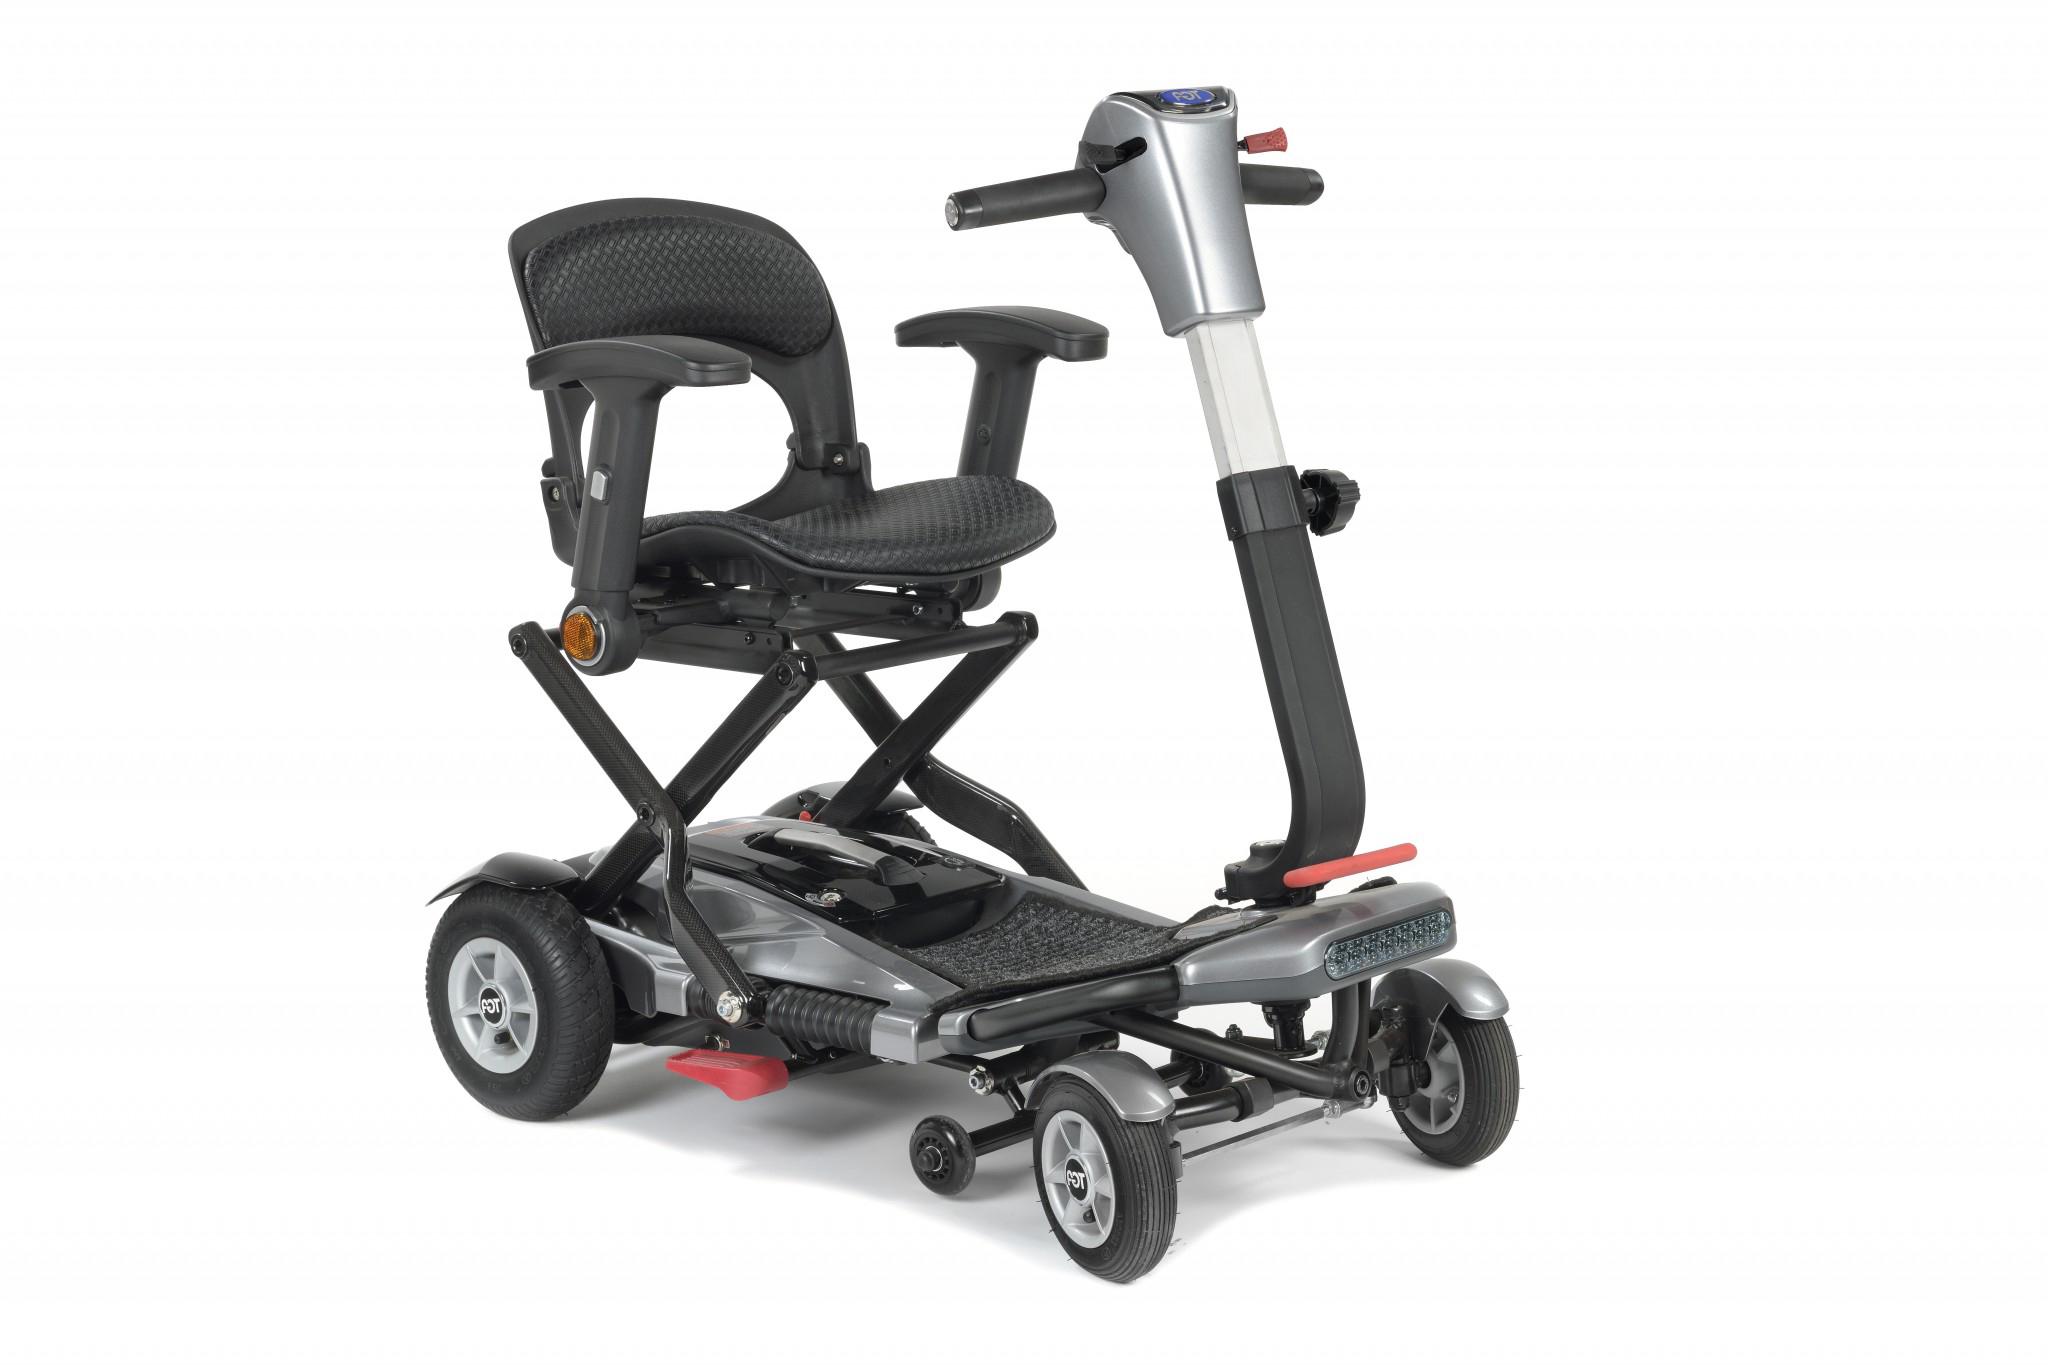 tga-minimo-autofold-scooter